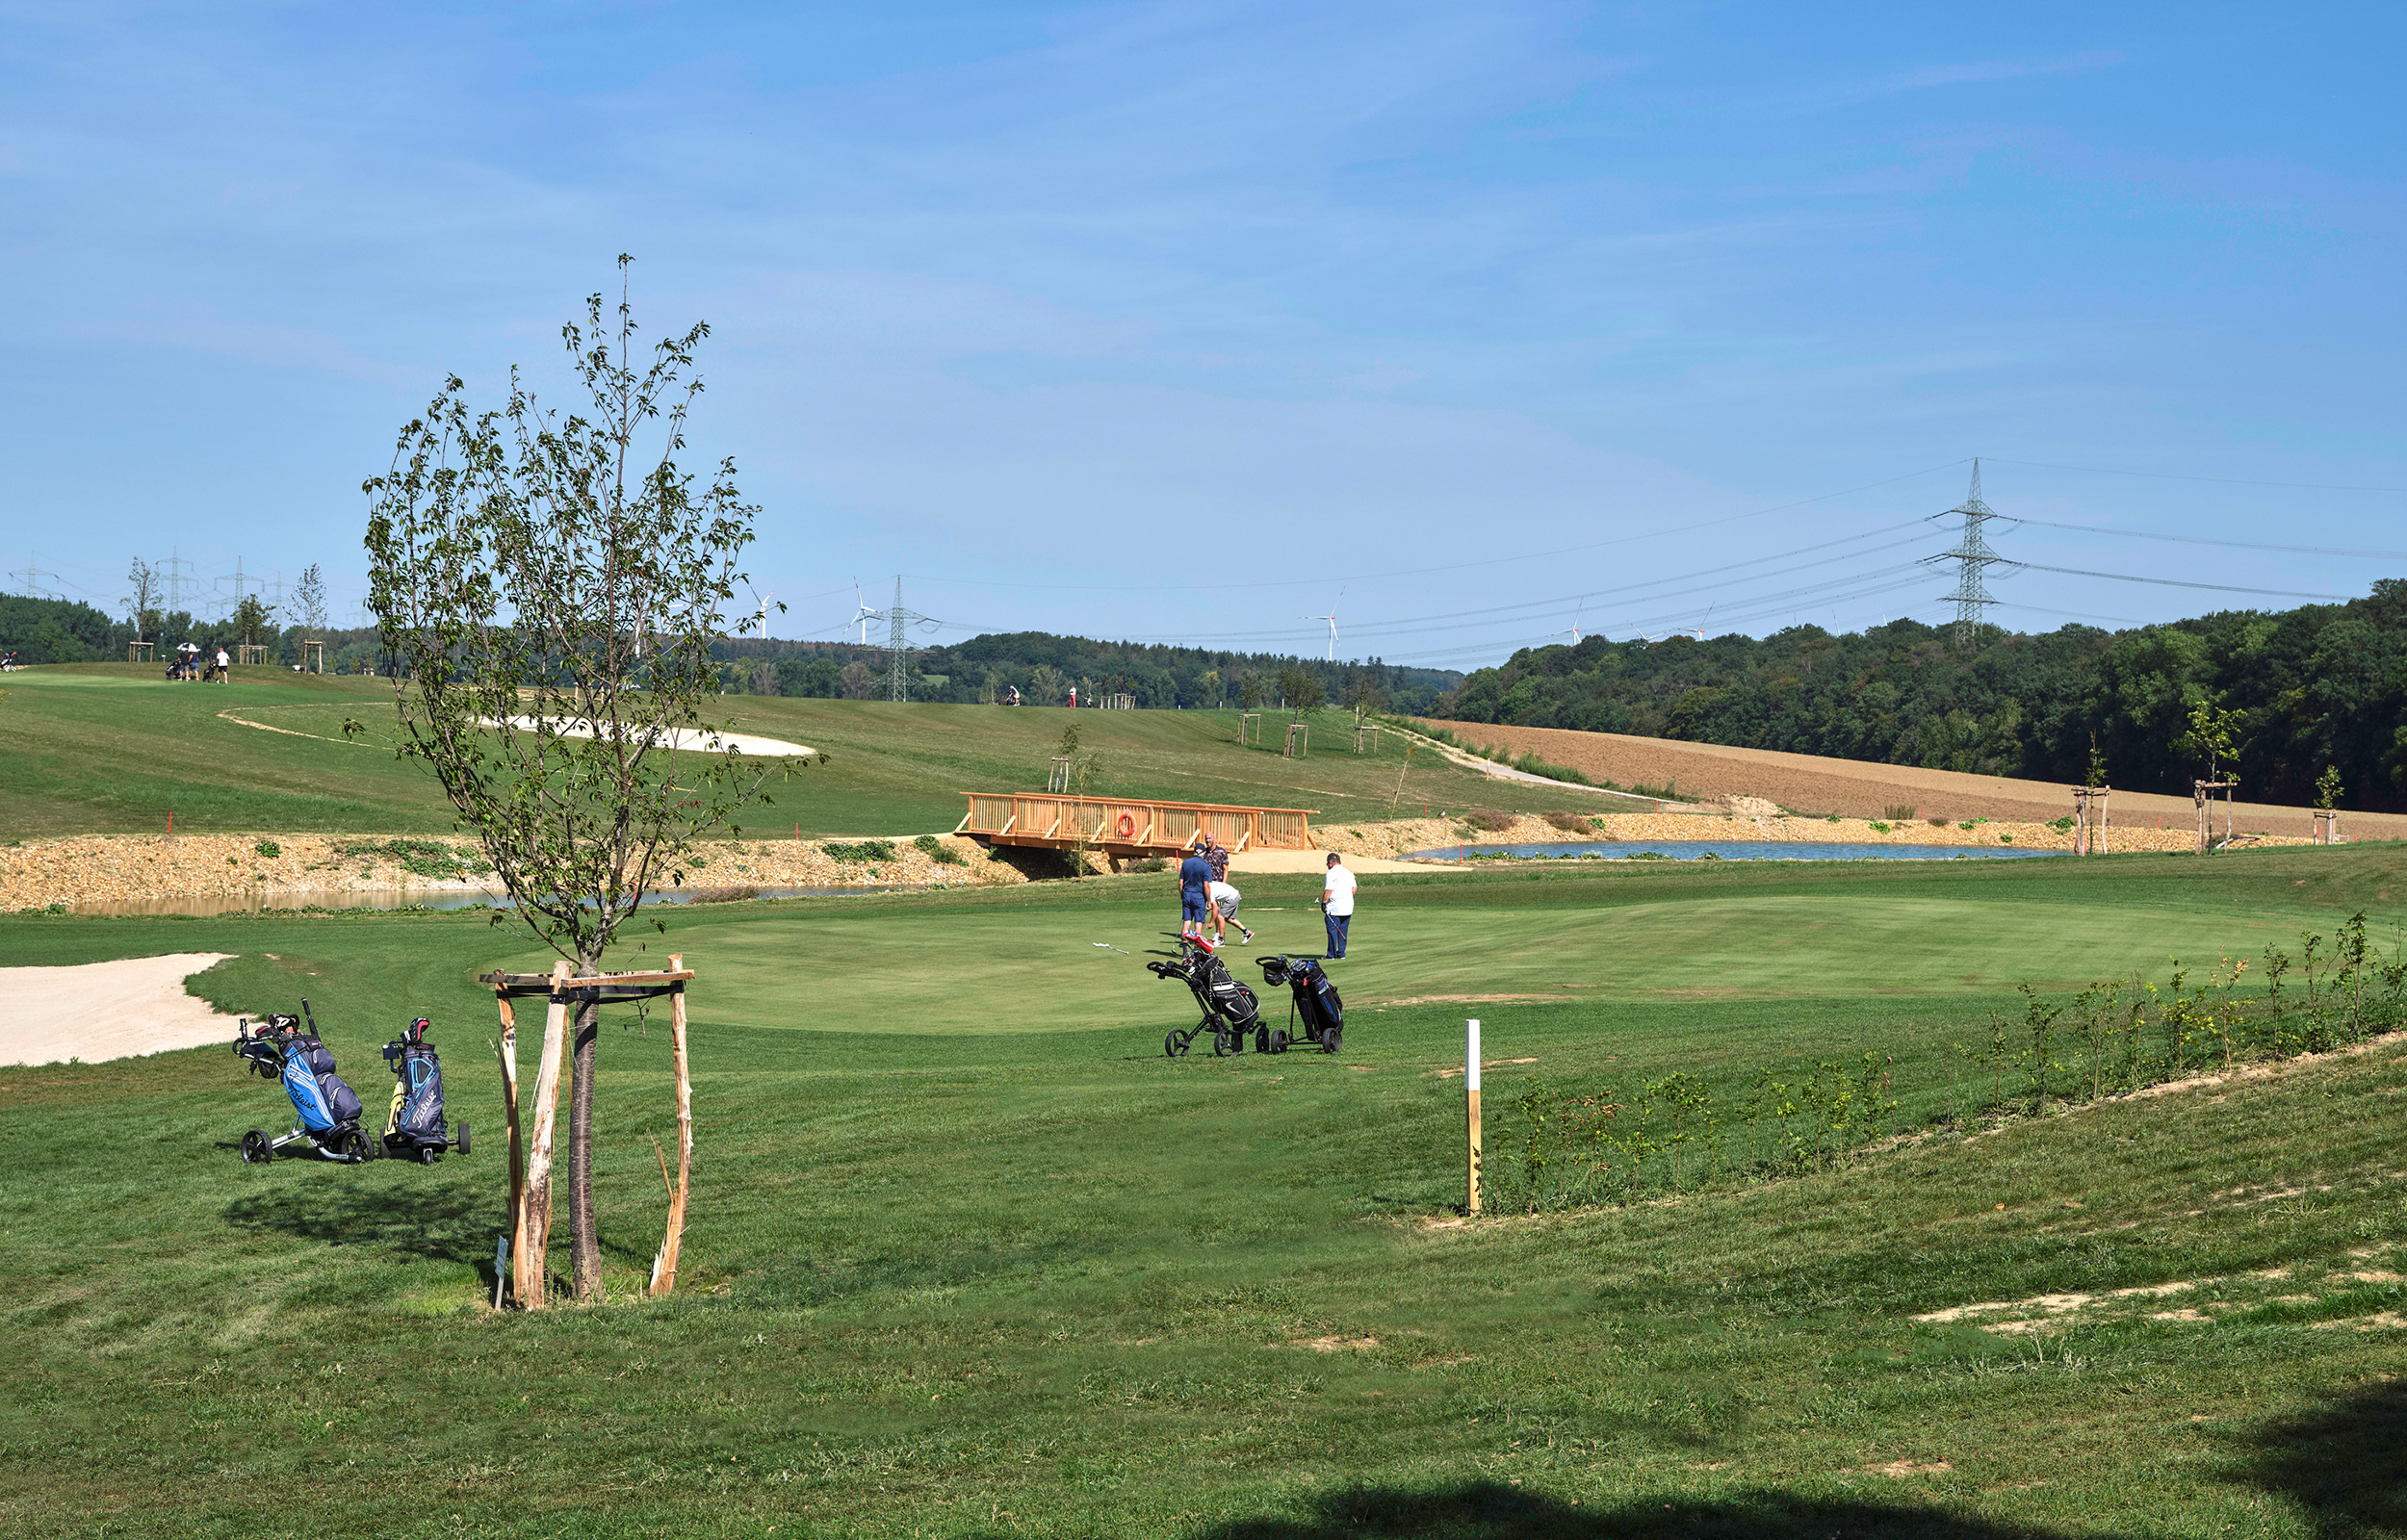 Neuer_Golfplatz